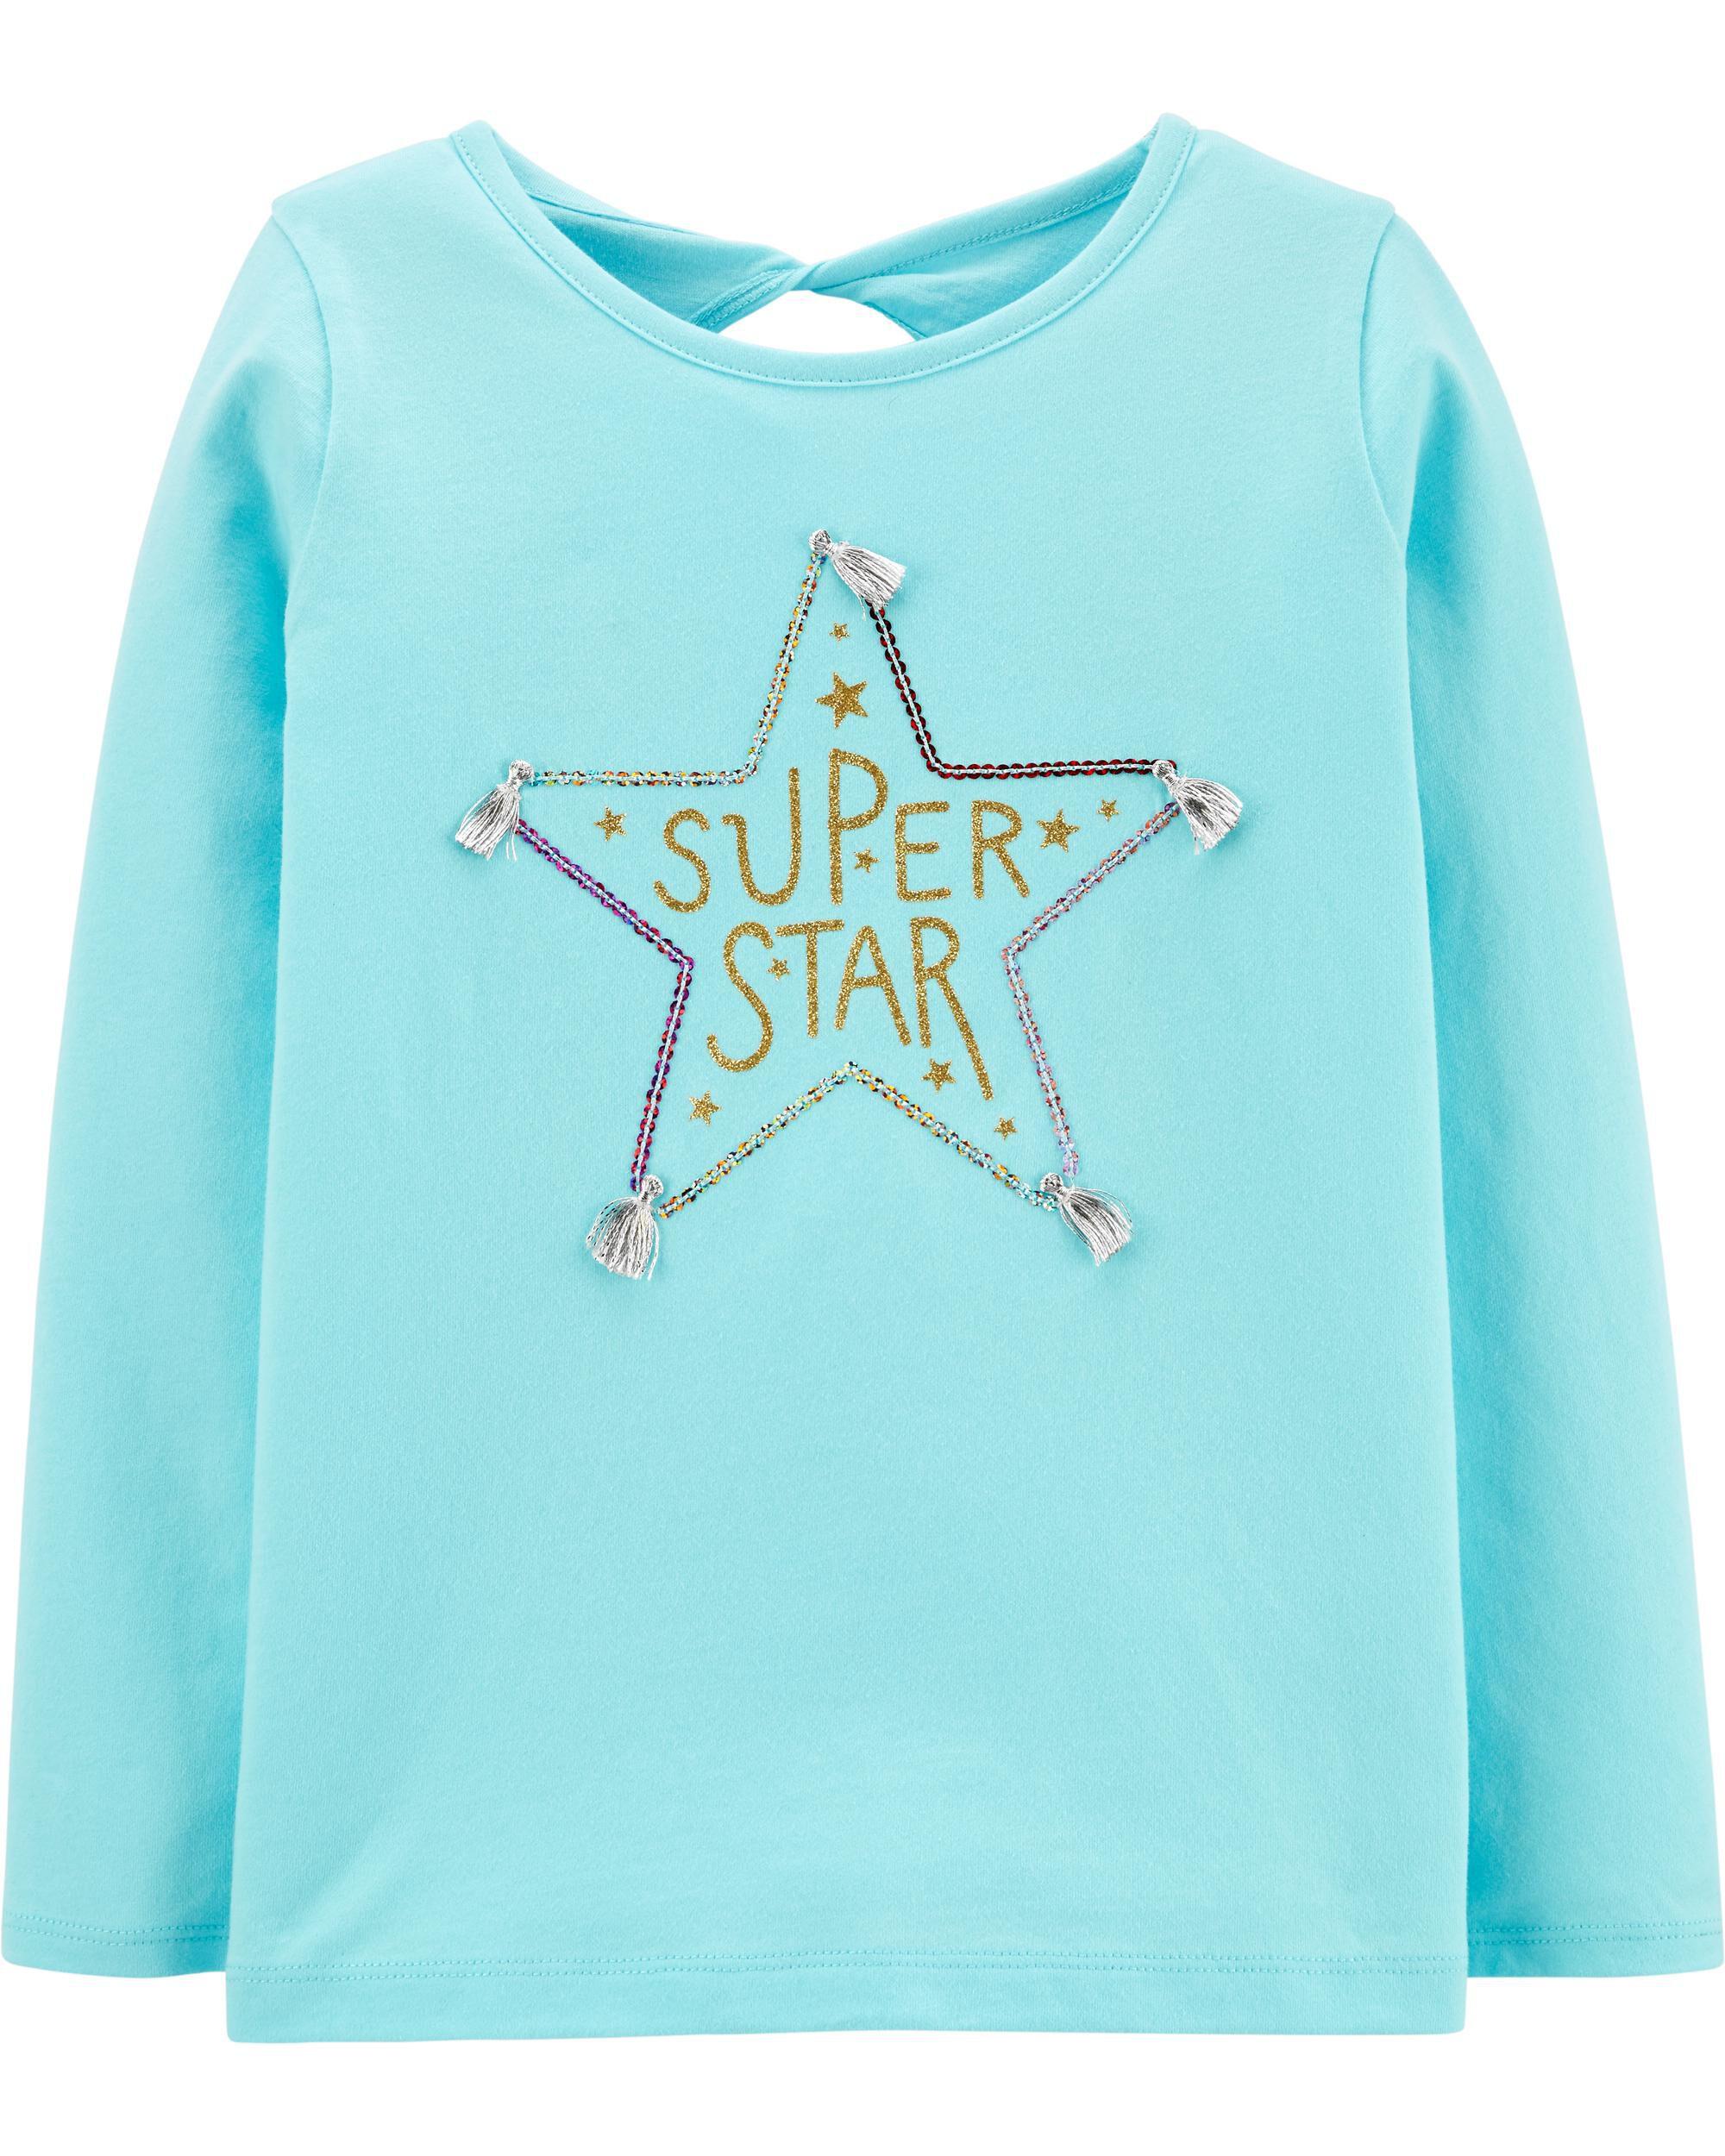 *CLEARANCE* Glitter Super Star Jersey Tee